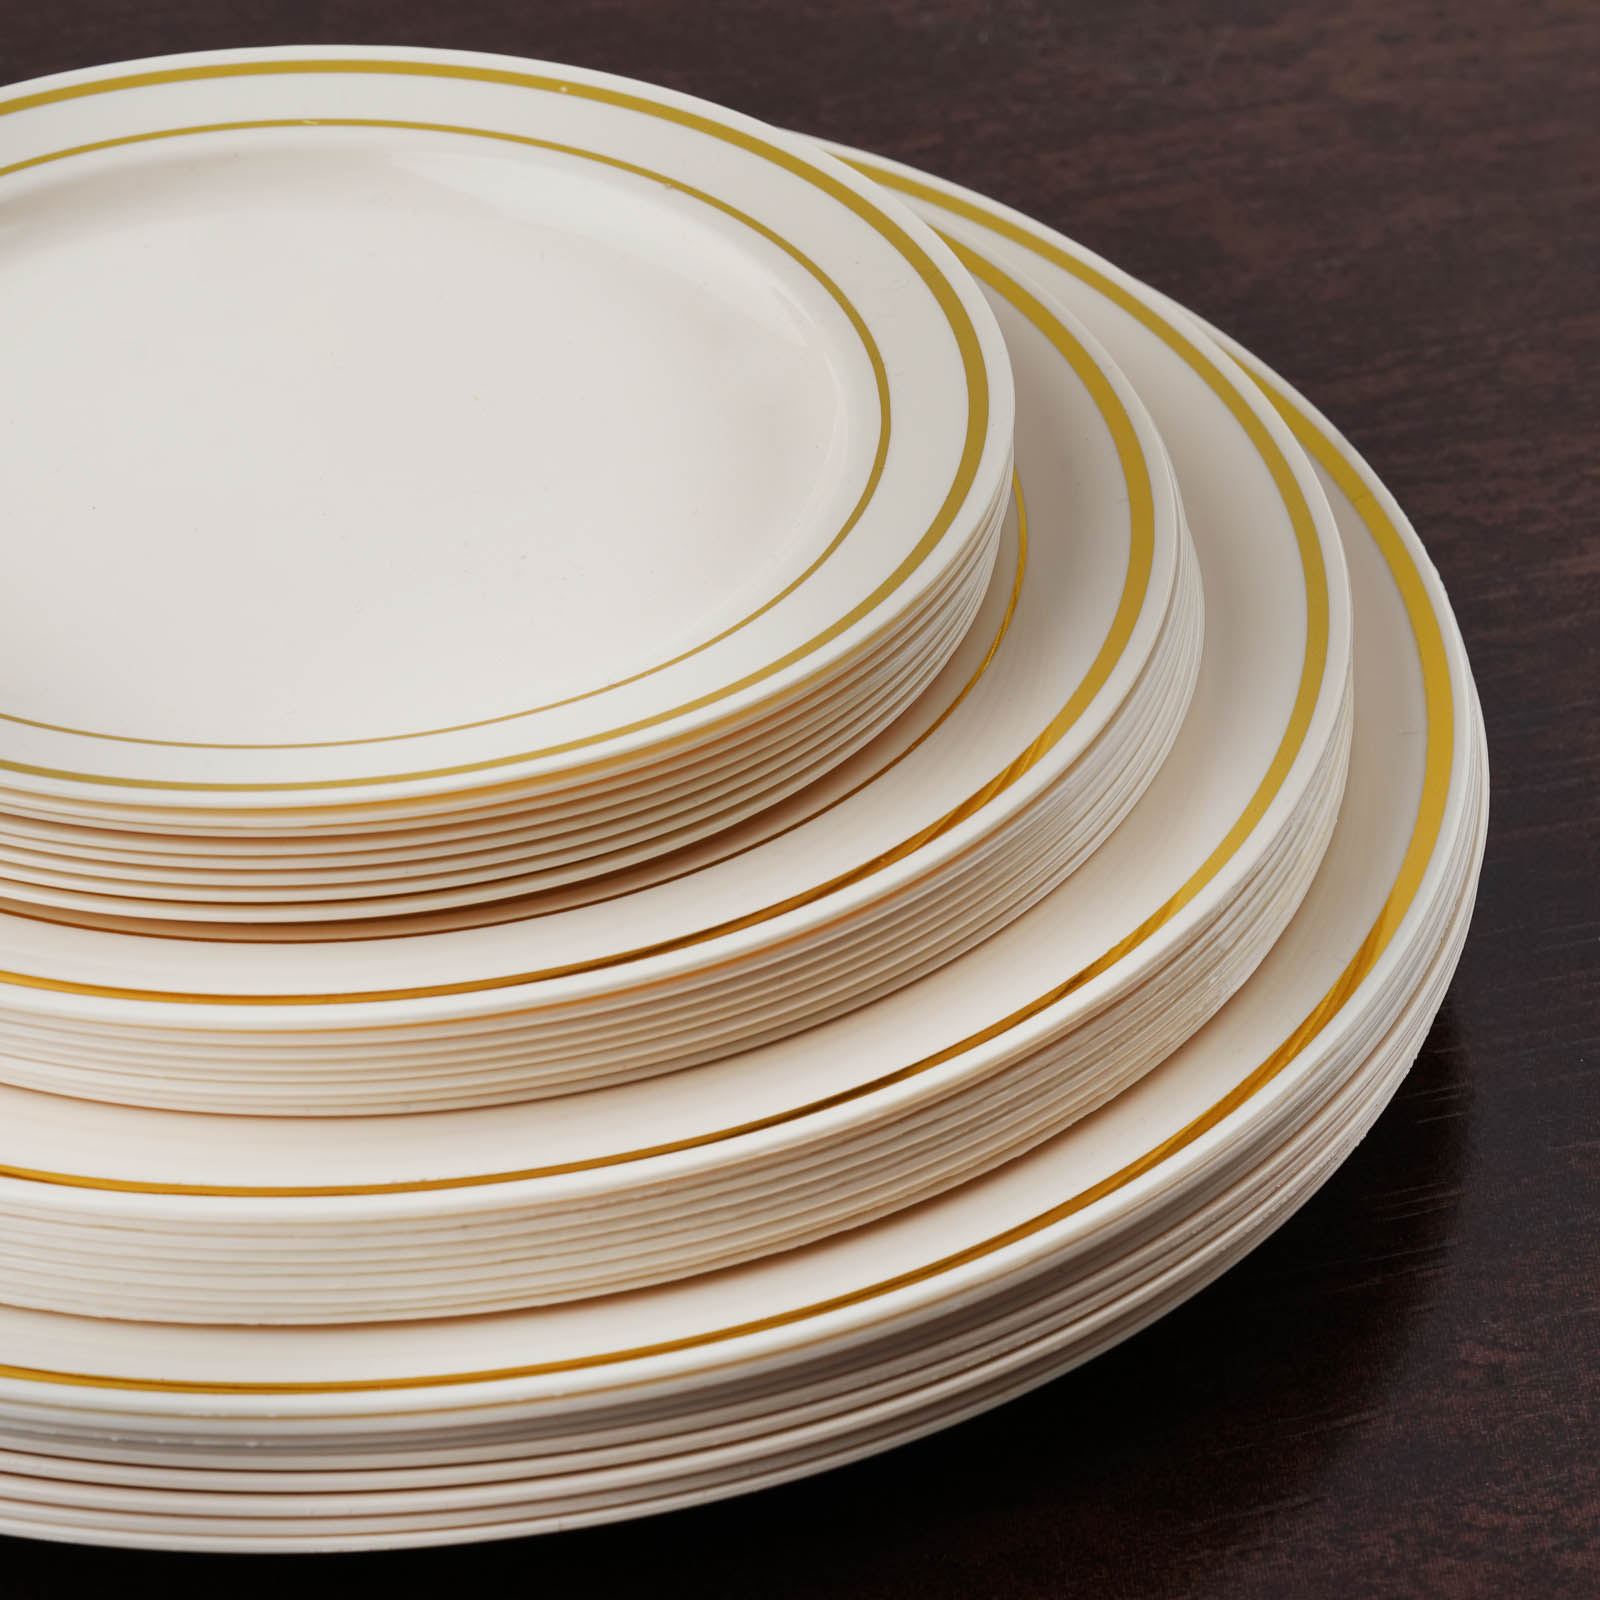 Piece Disposable Plastic Wedding Tableware Dinnerware Set. Silver Rimmed Dinner and Dessert Plates, Silver Cutlery Set, Silver Rimmed Tumblers, Linen Feel Napkins With Rhinestone Napkin Rings.